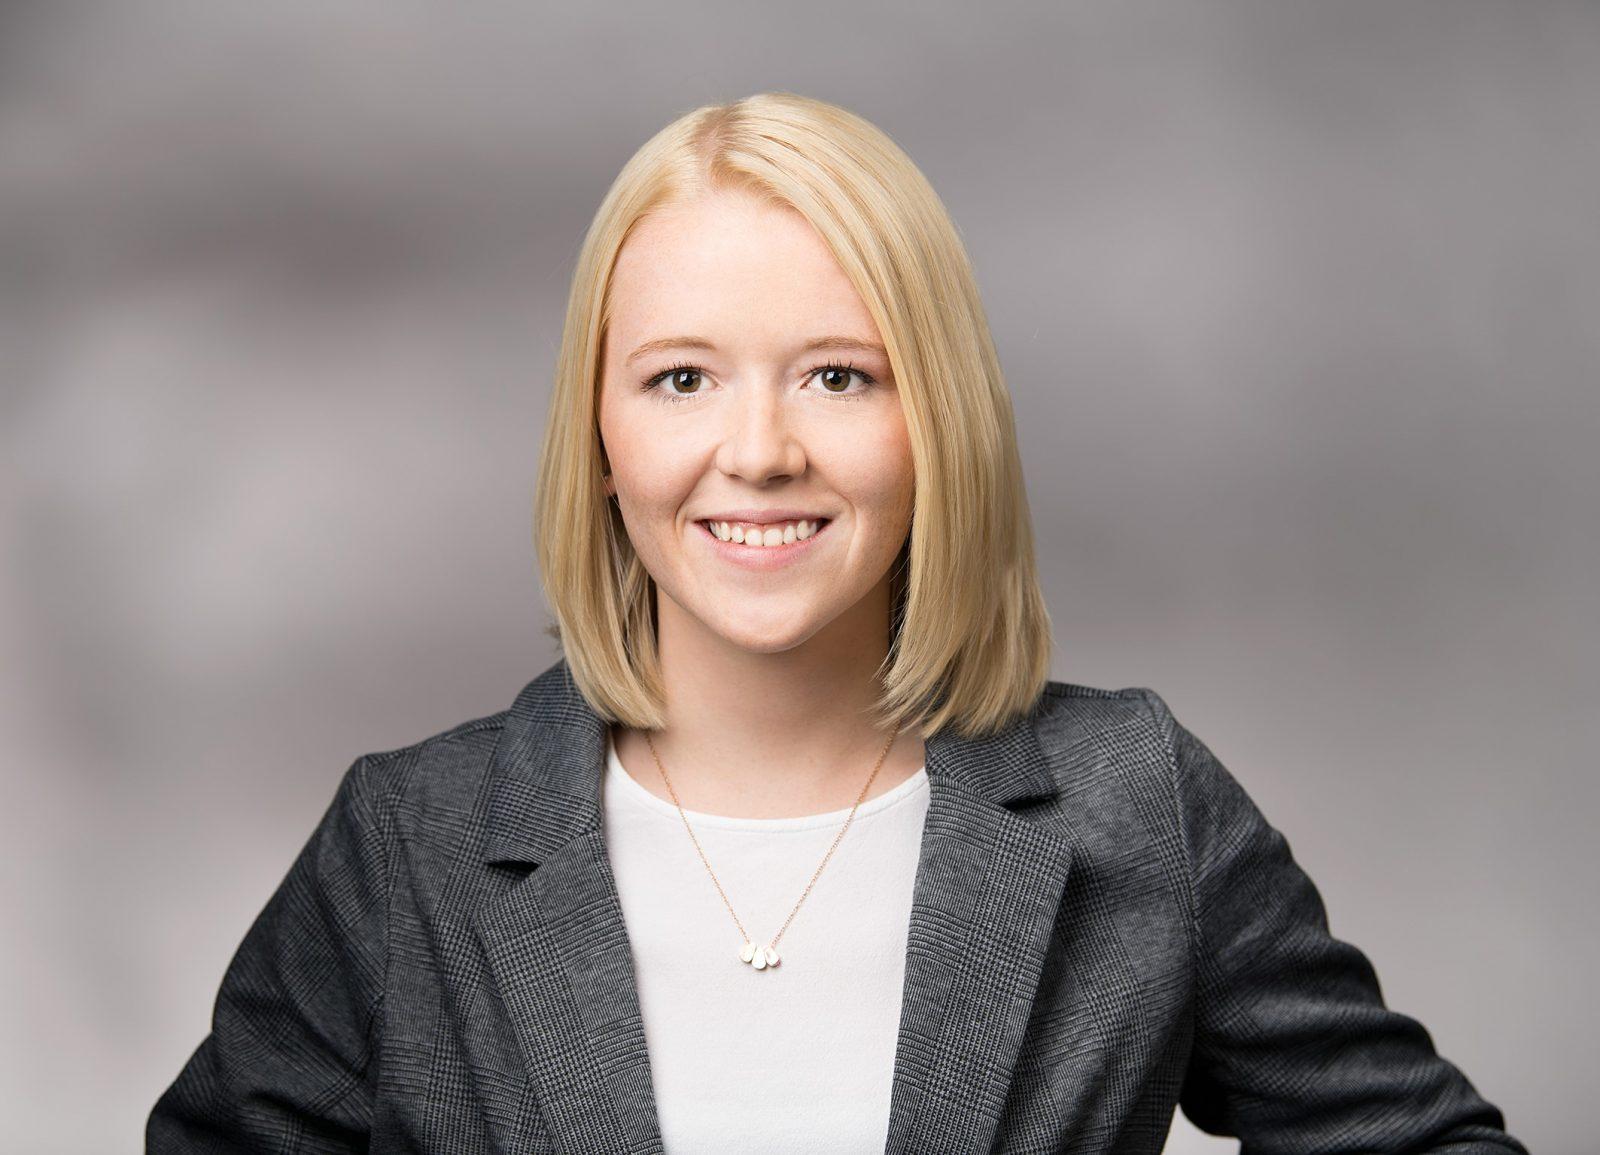 Lena Milacher